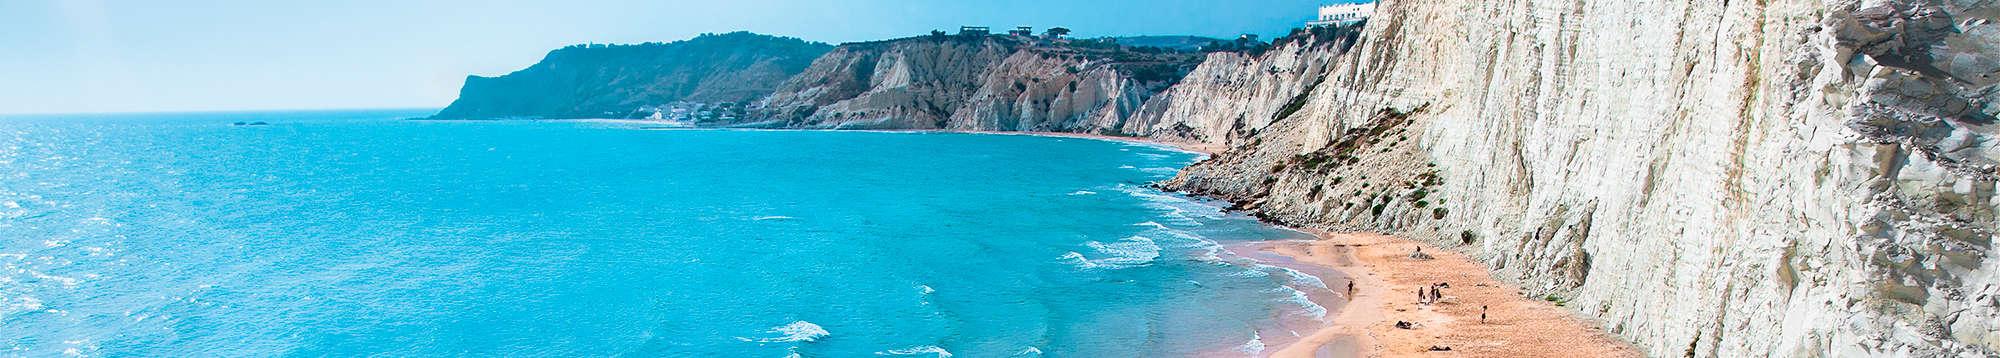 Escapadas fin de semana en Sicilia